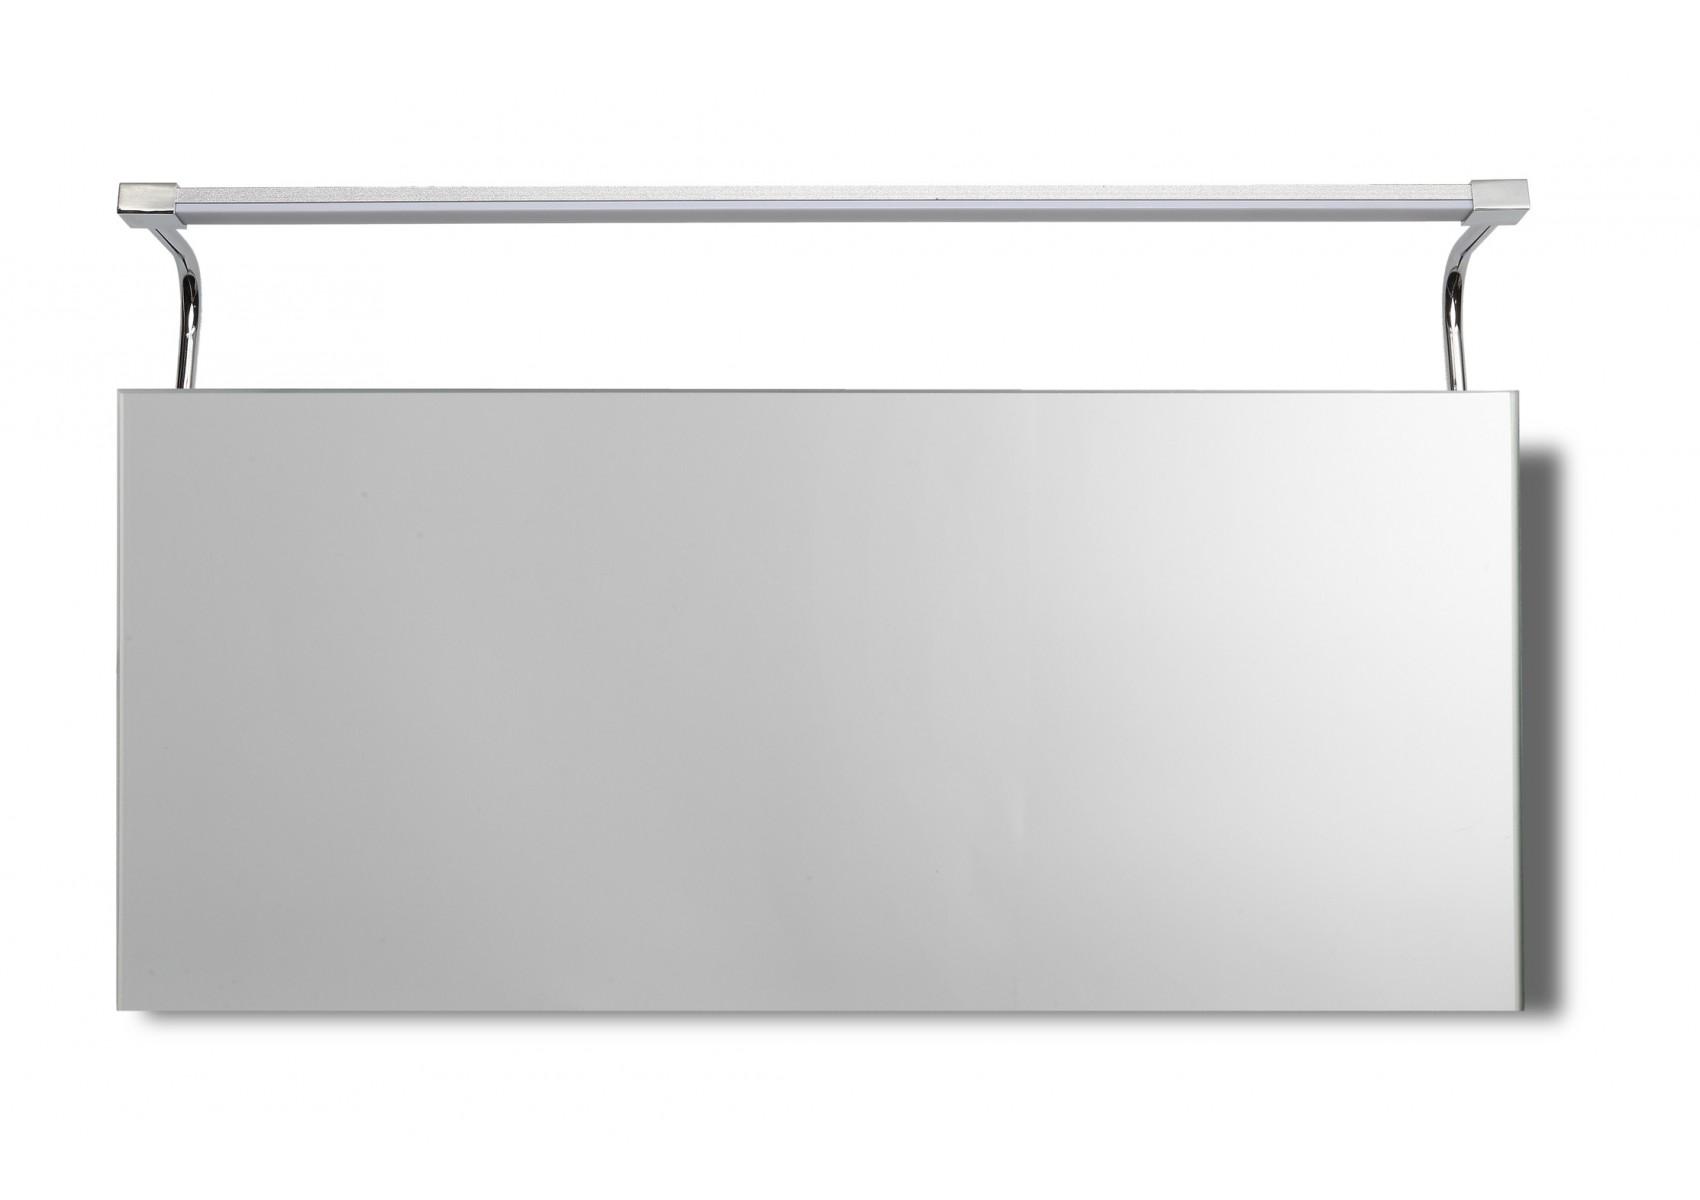 Applique design sisley salle de bain et tableau 62cm boite design - Applique salle de bain design ...